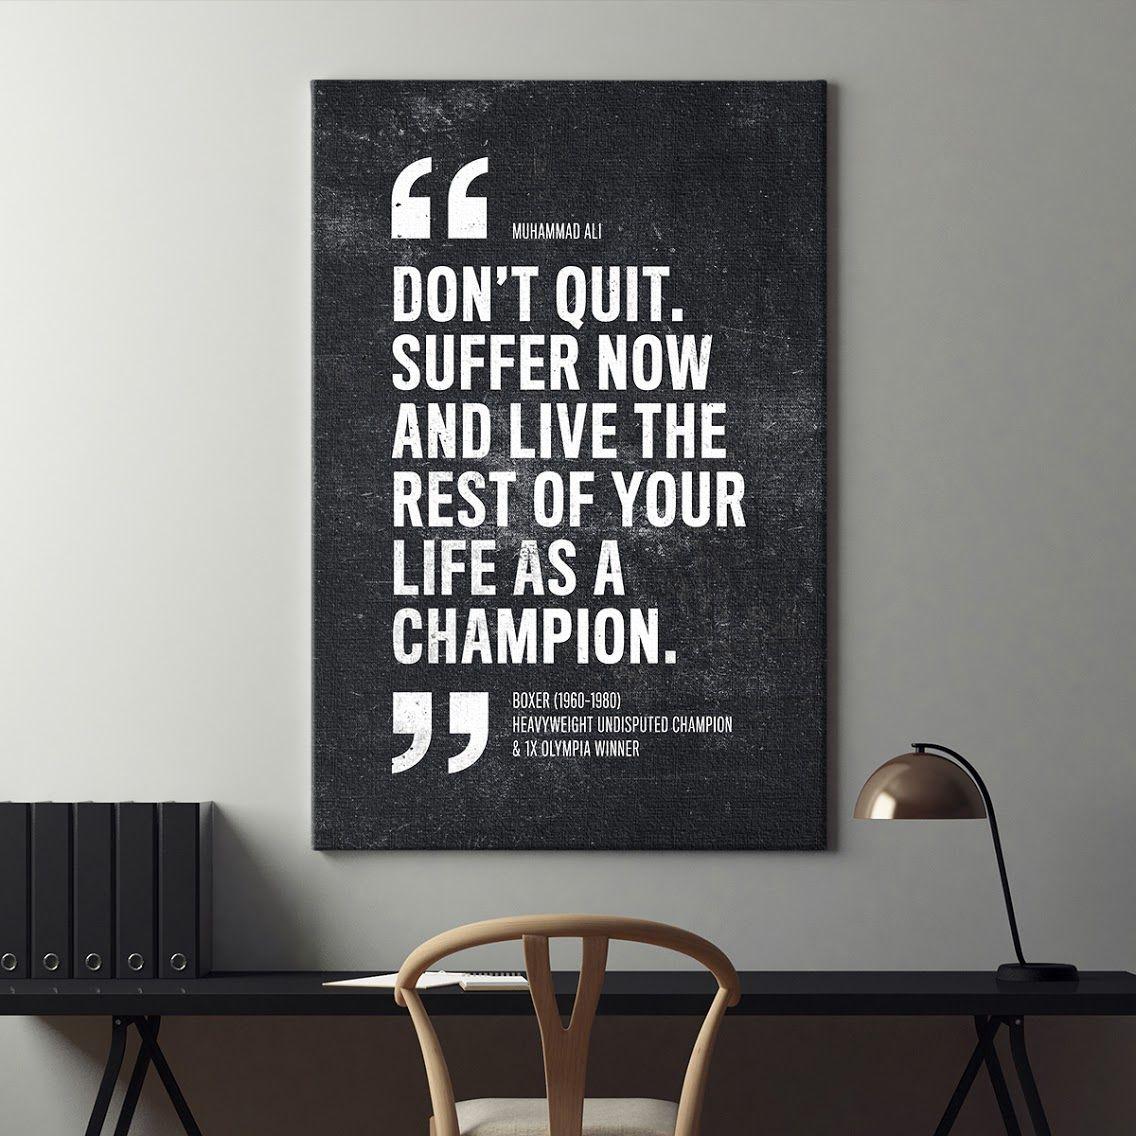 Motivation Zitat auf Leinwand LIFE IS WHAT YOU MAKE IT Motivationsspruch